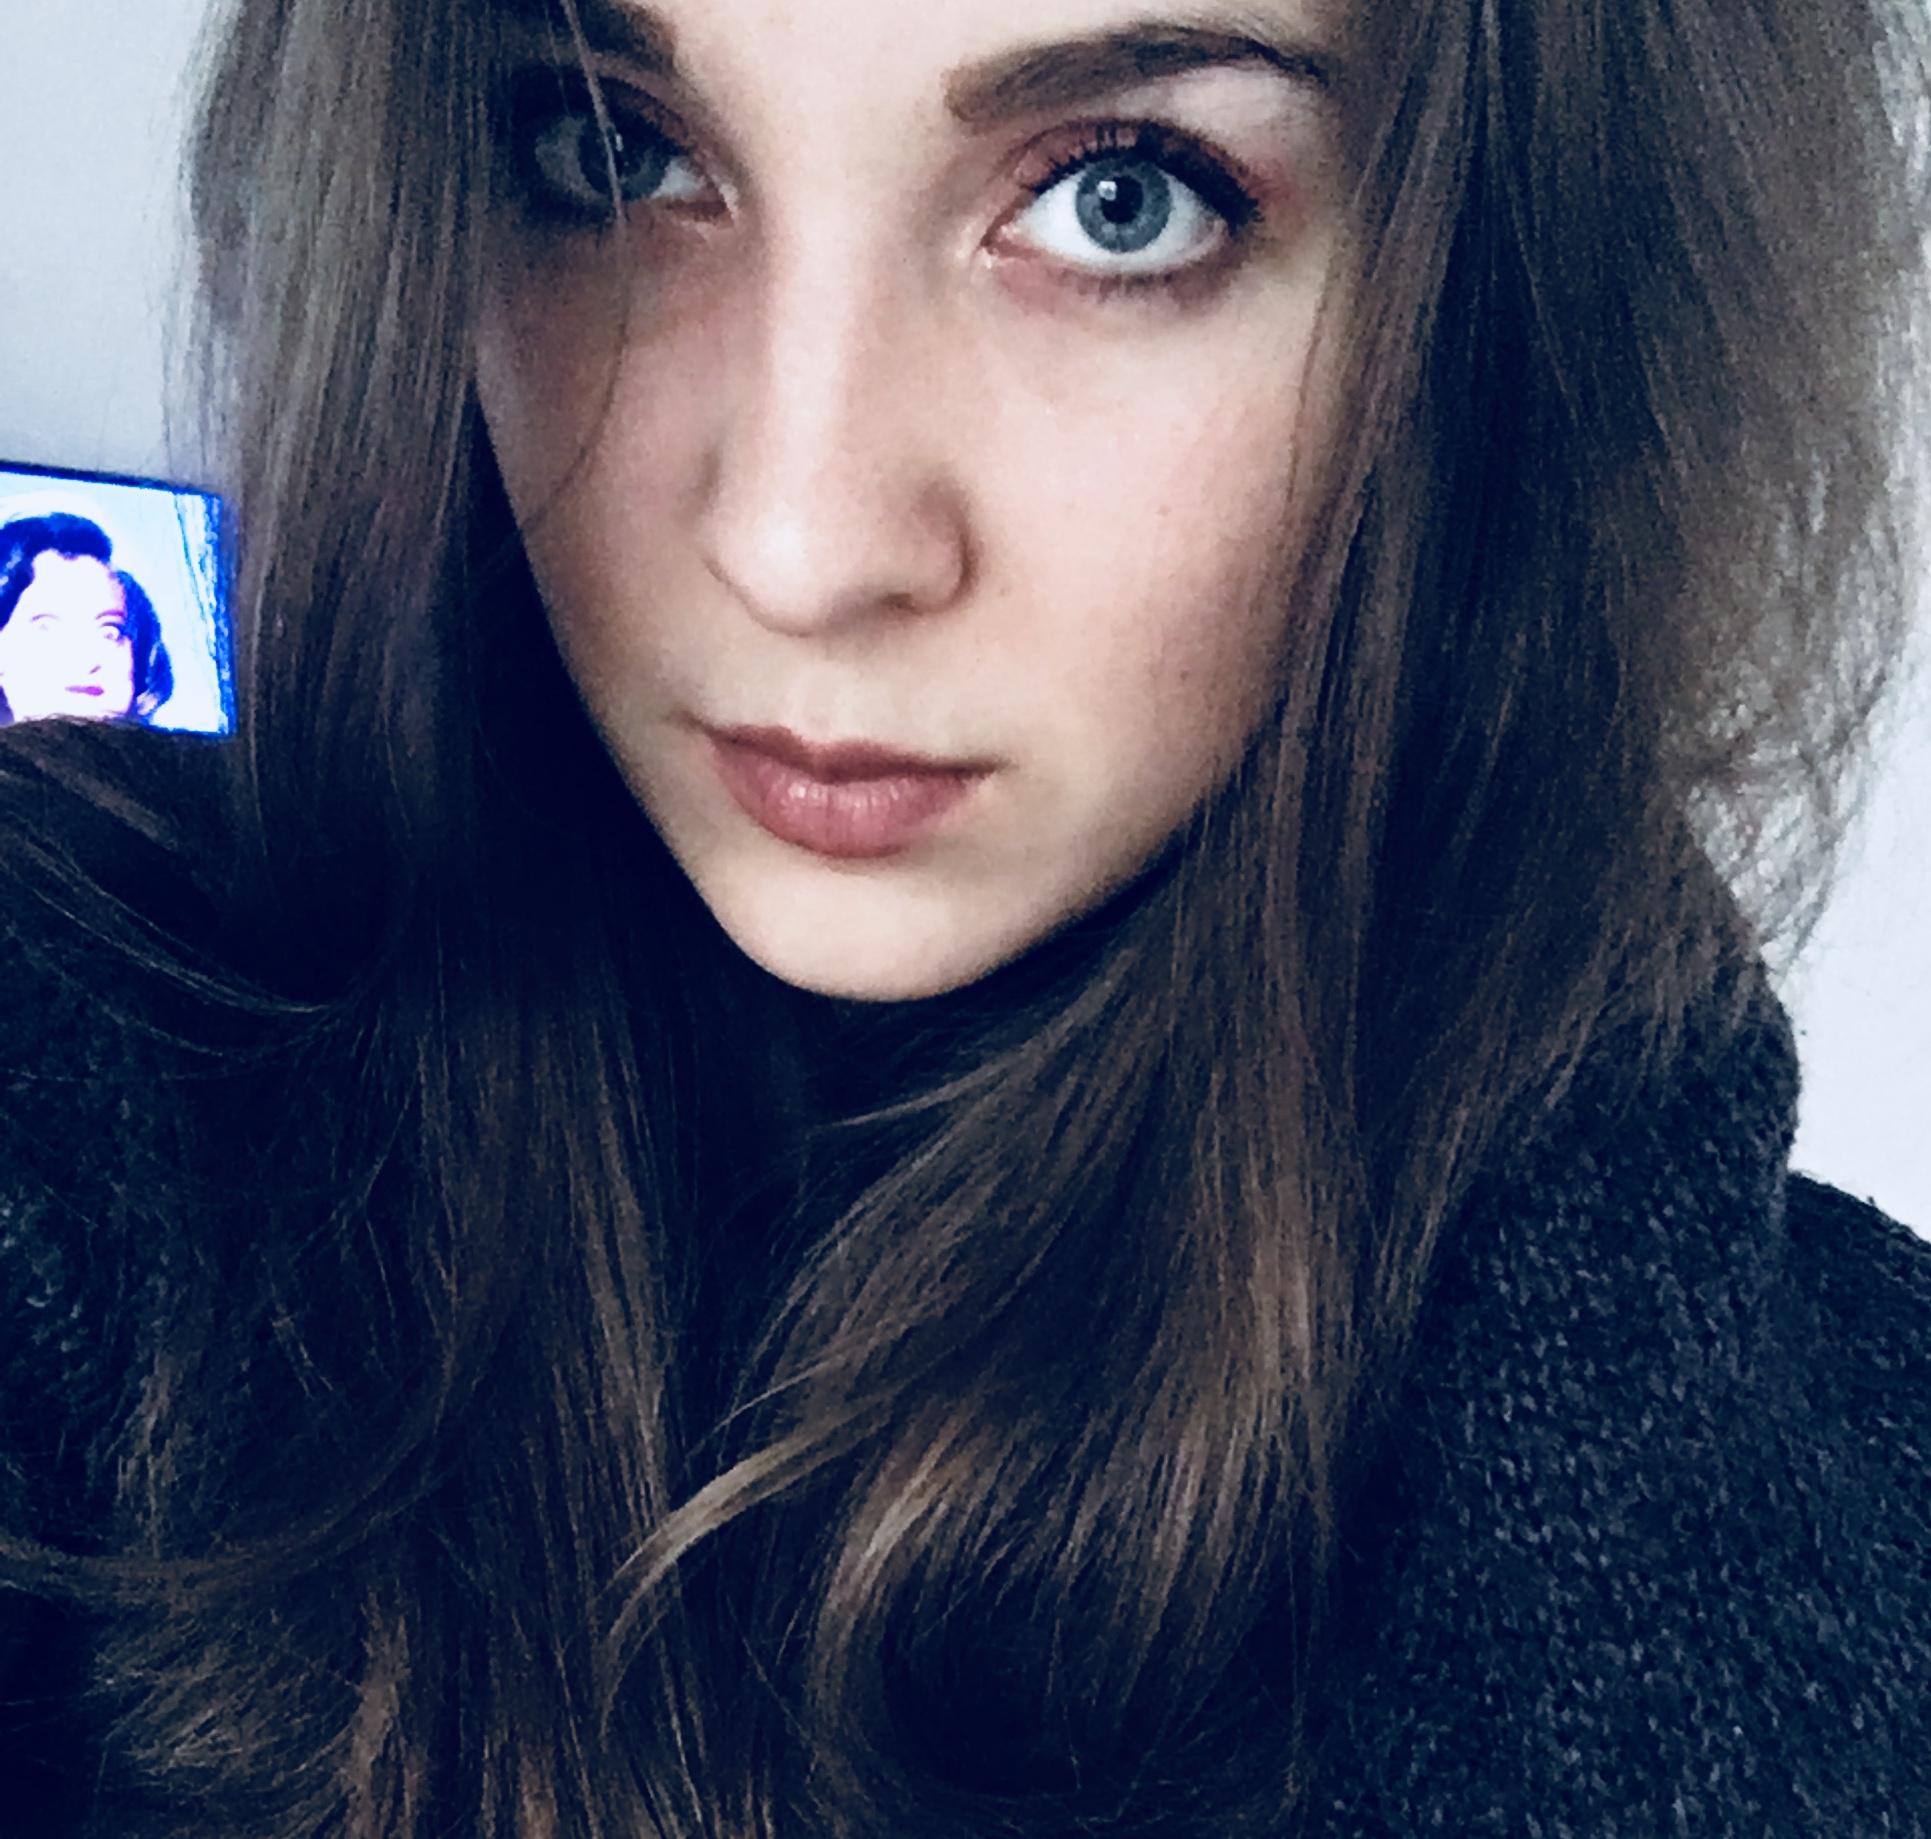 Michele Denise Friemann